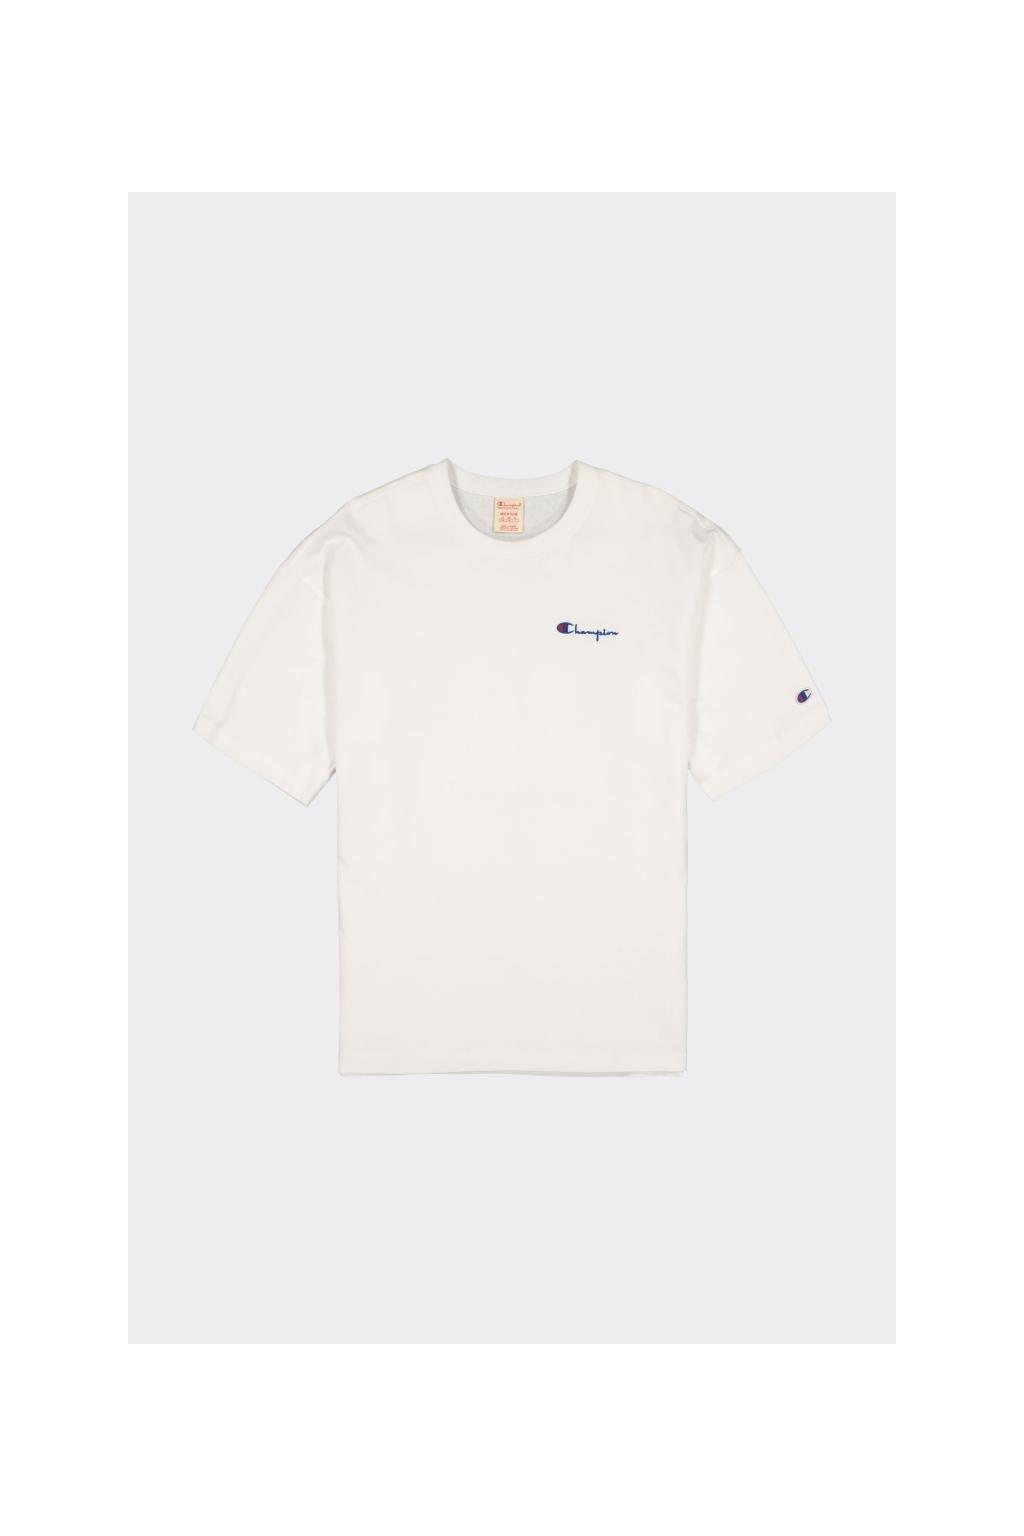 Champion Premium pánské tričko s malým logem - bílé